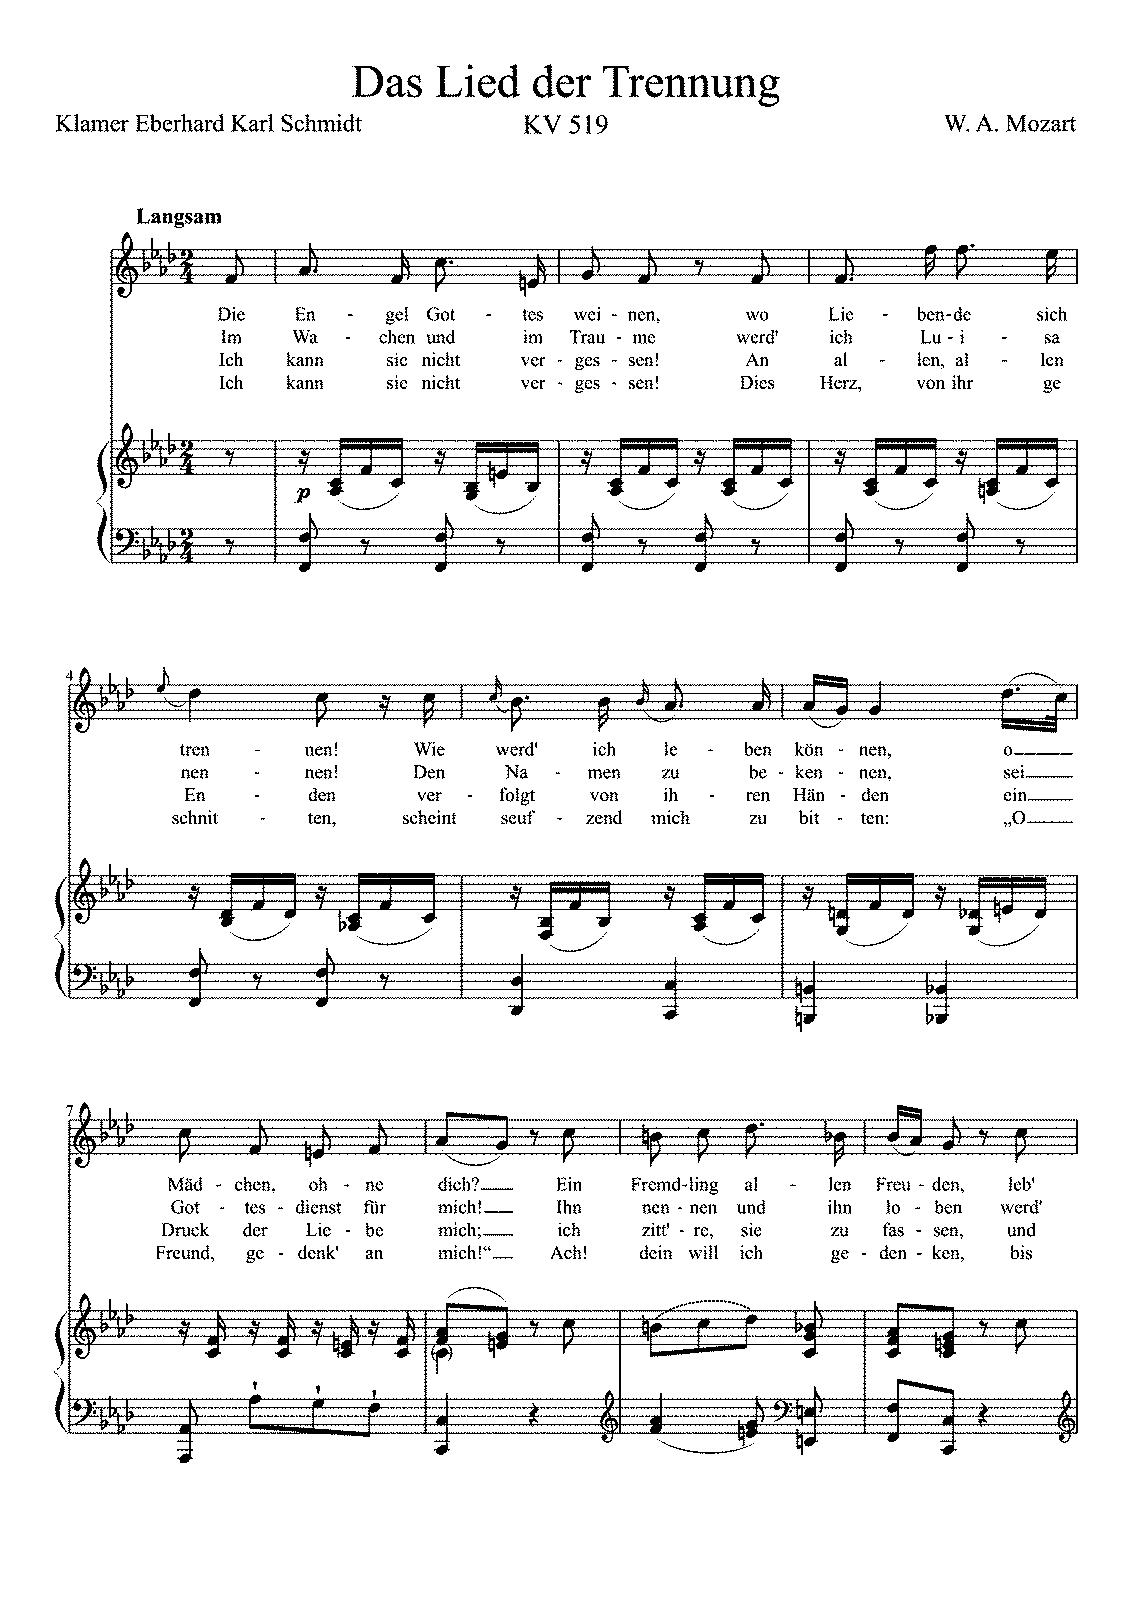 Das lied der trennung k519 mozart wolfgang amadeus imslp sheet music hexwebz Image collections